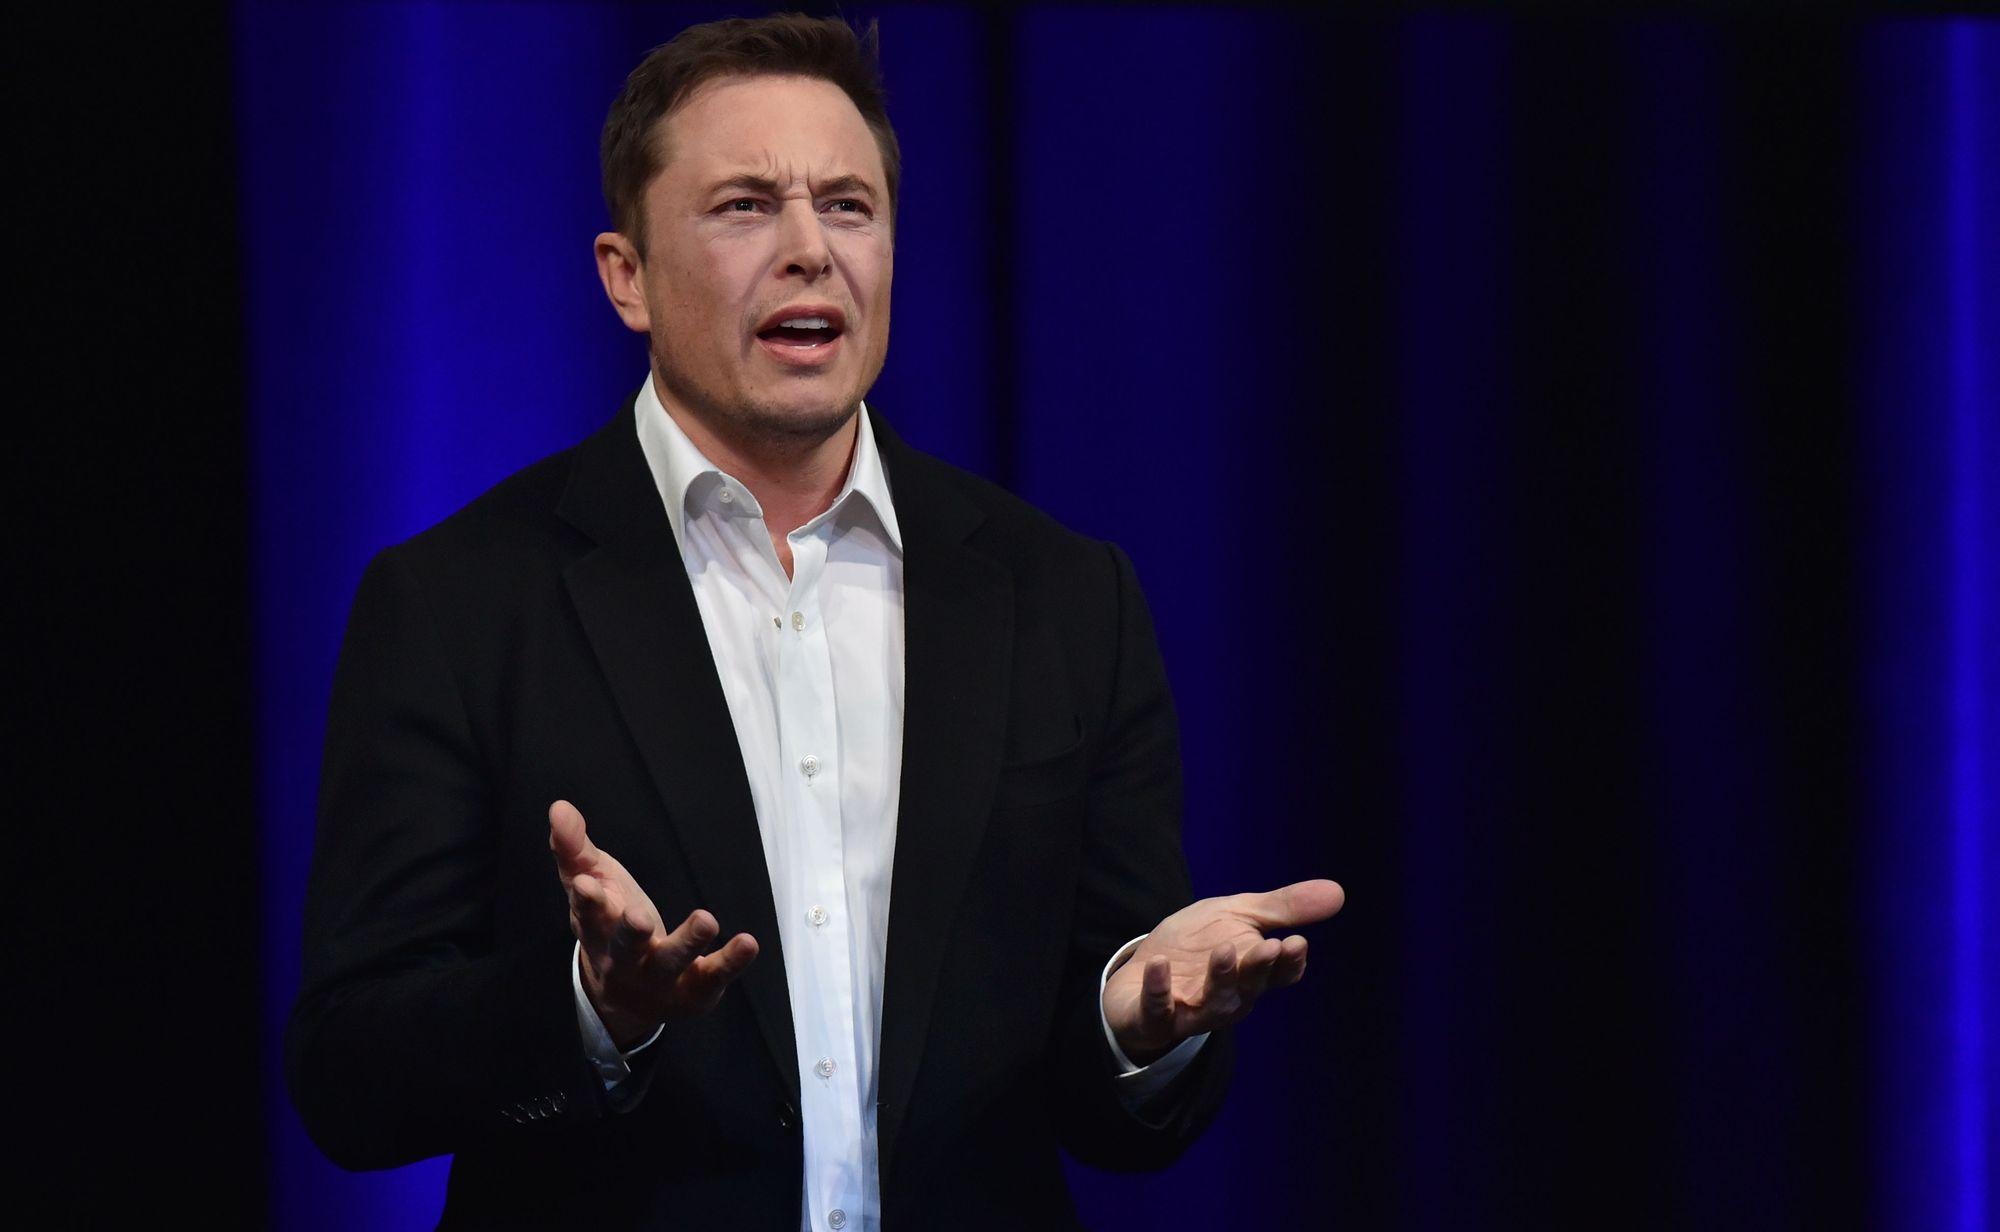 Elon Musk Wields Veto Power over Every New Employee as Tesla Layoffs Mount